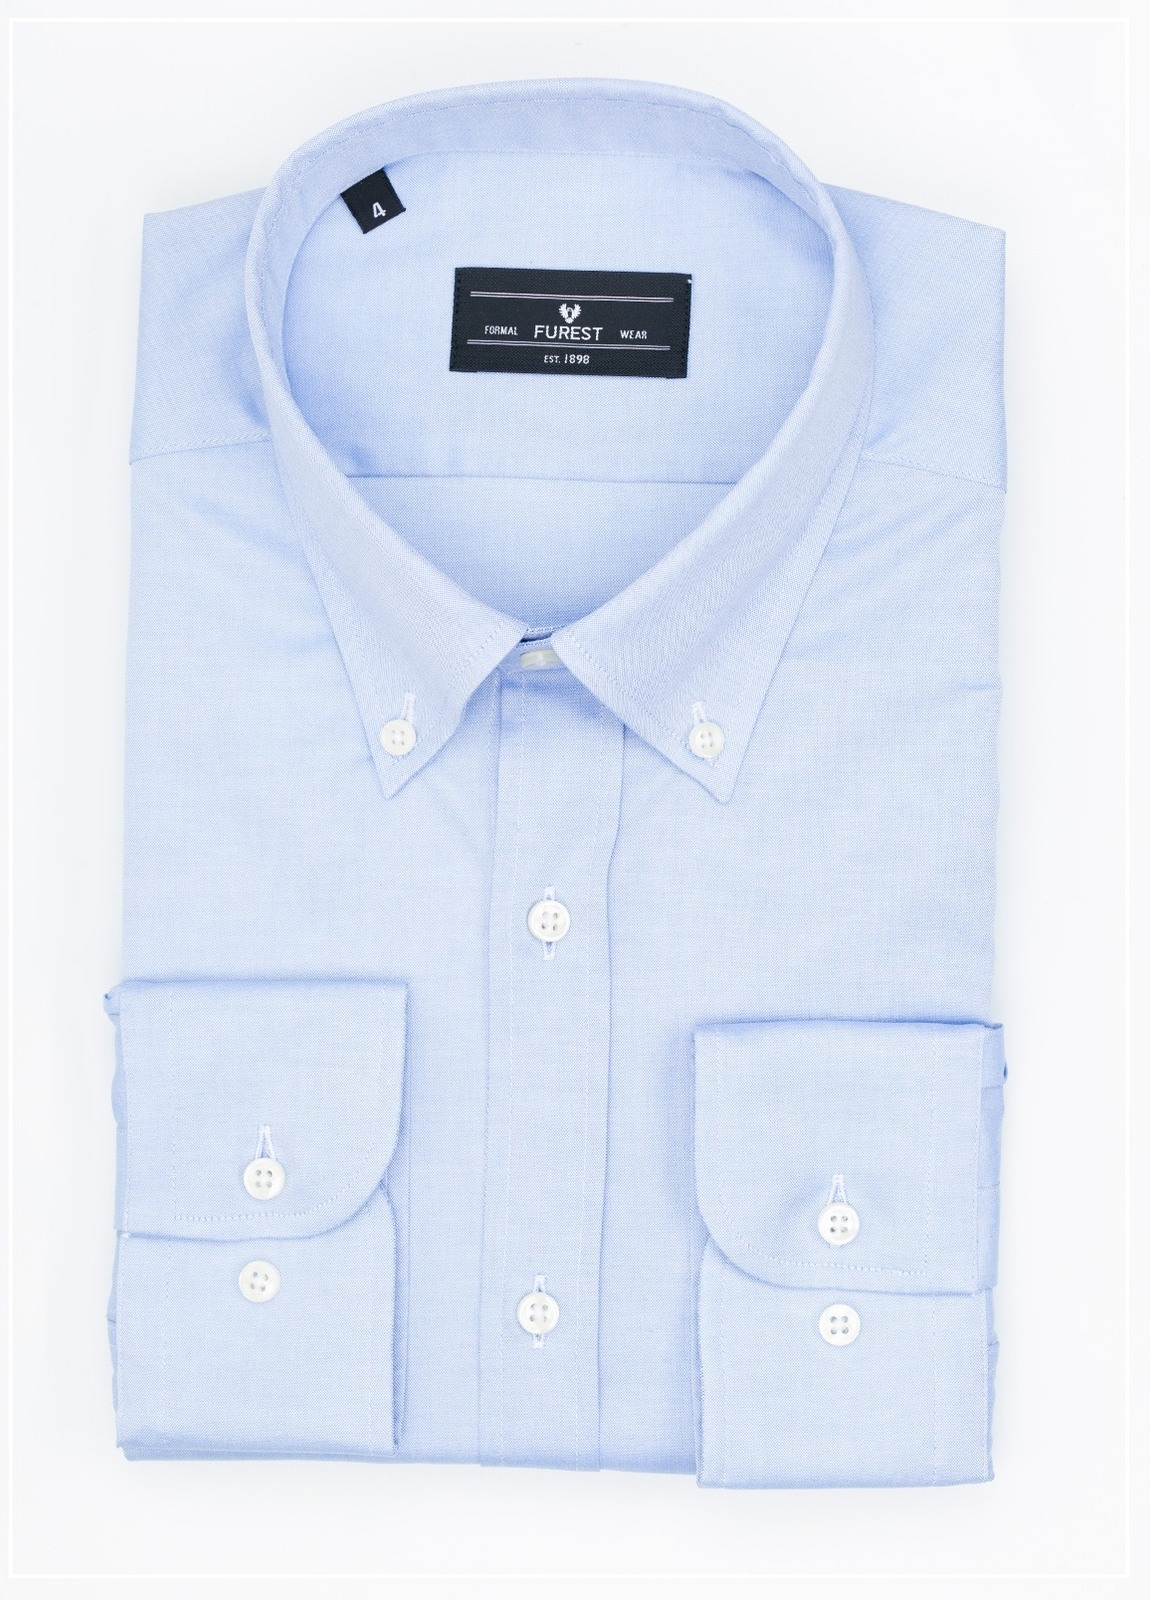 Camisa Formal Wear REGULAR FIT modelo BOTTON DOWN color azul , 100% Algodón.